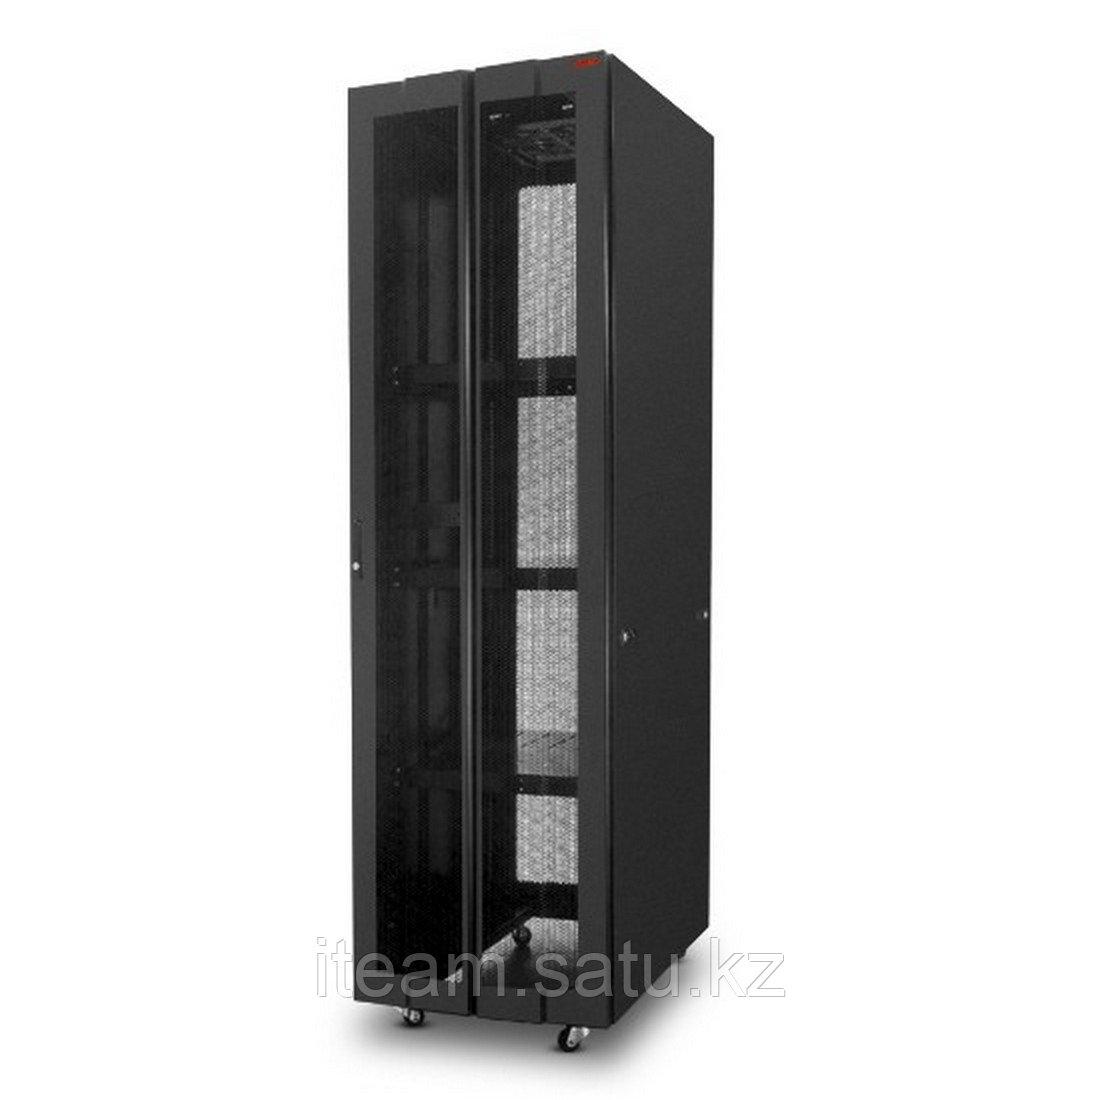 Шкаф серверный SHIP 601S.6842.65.100 42U, 600*800*2000 мм